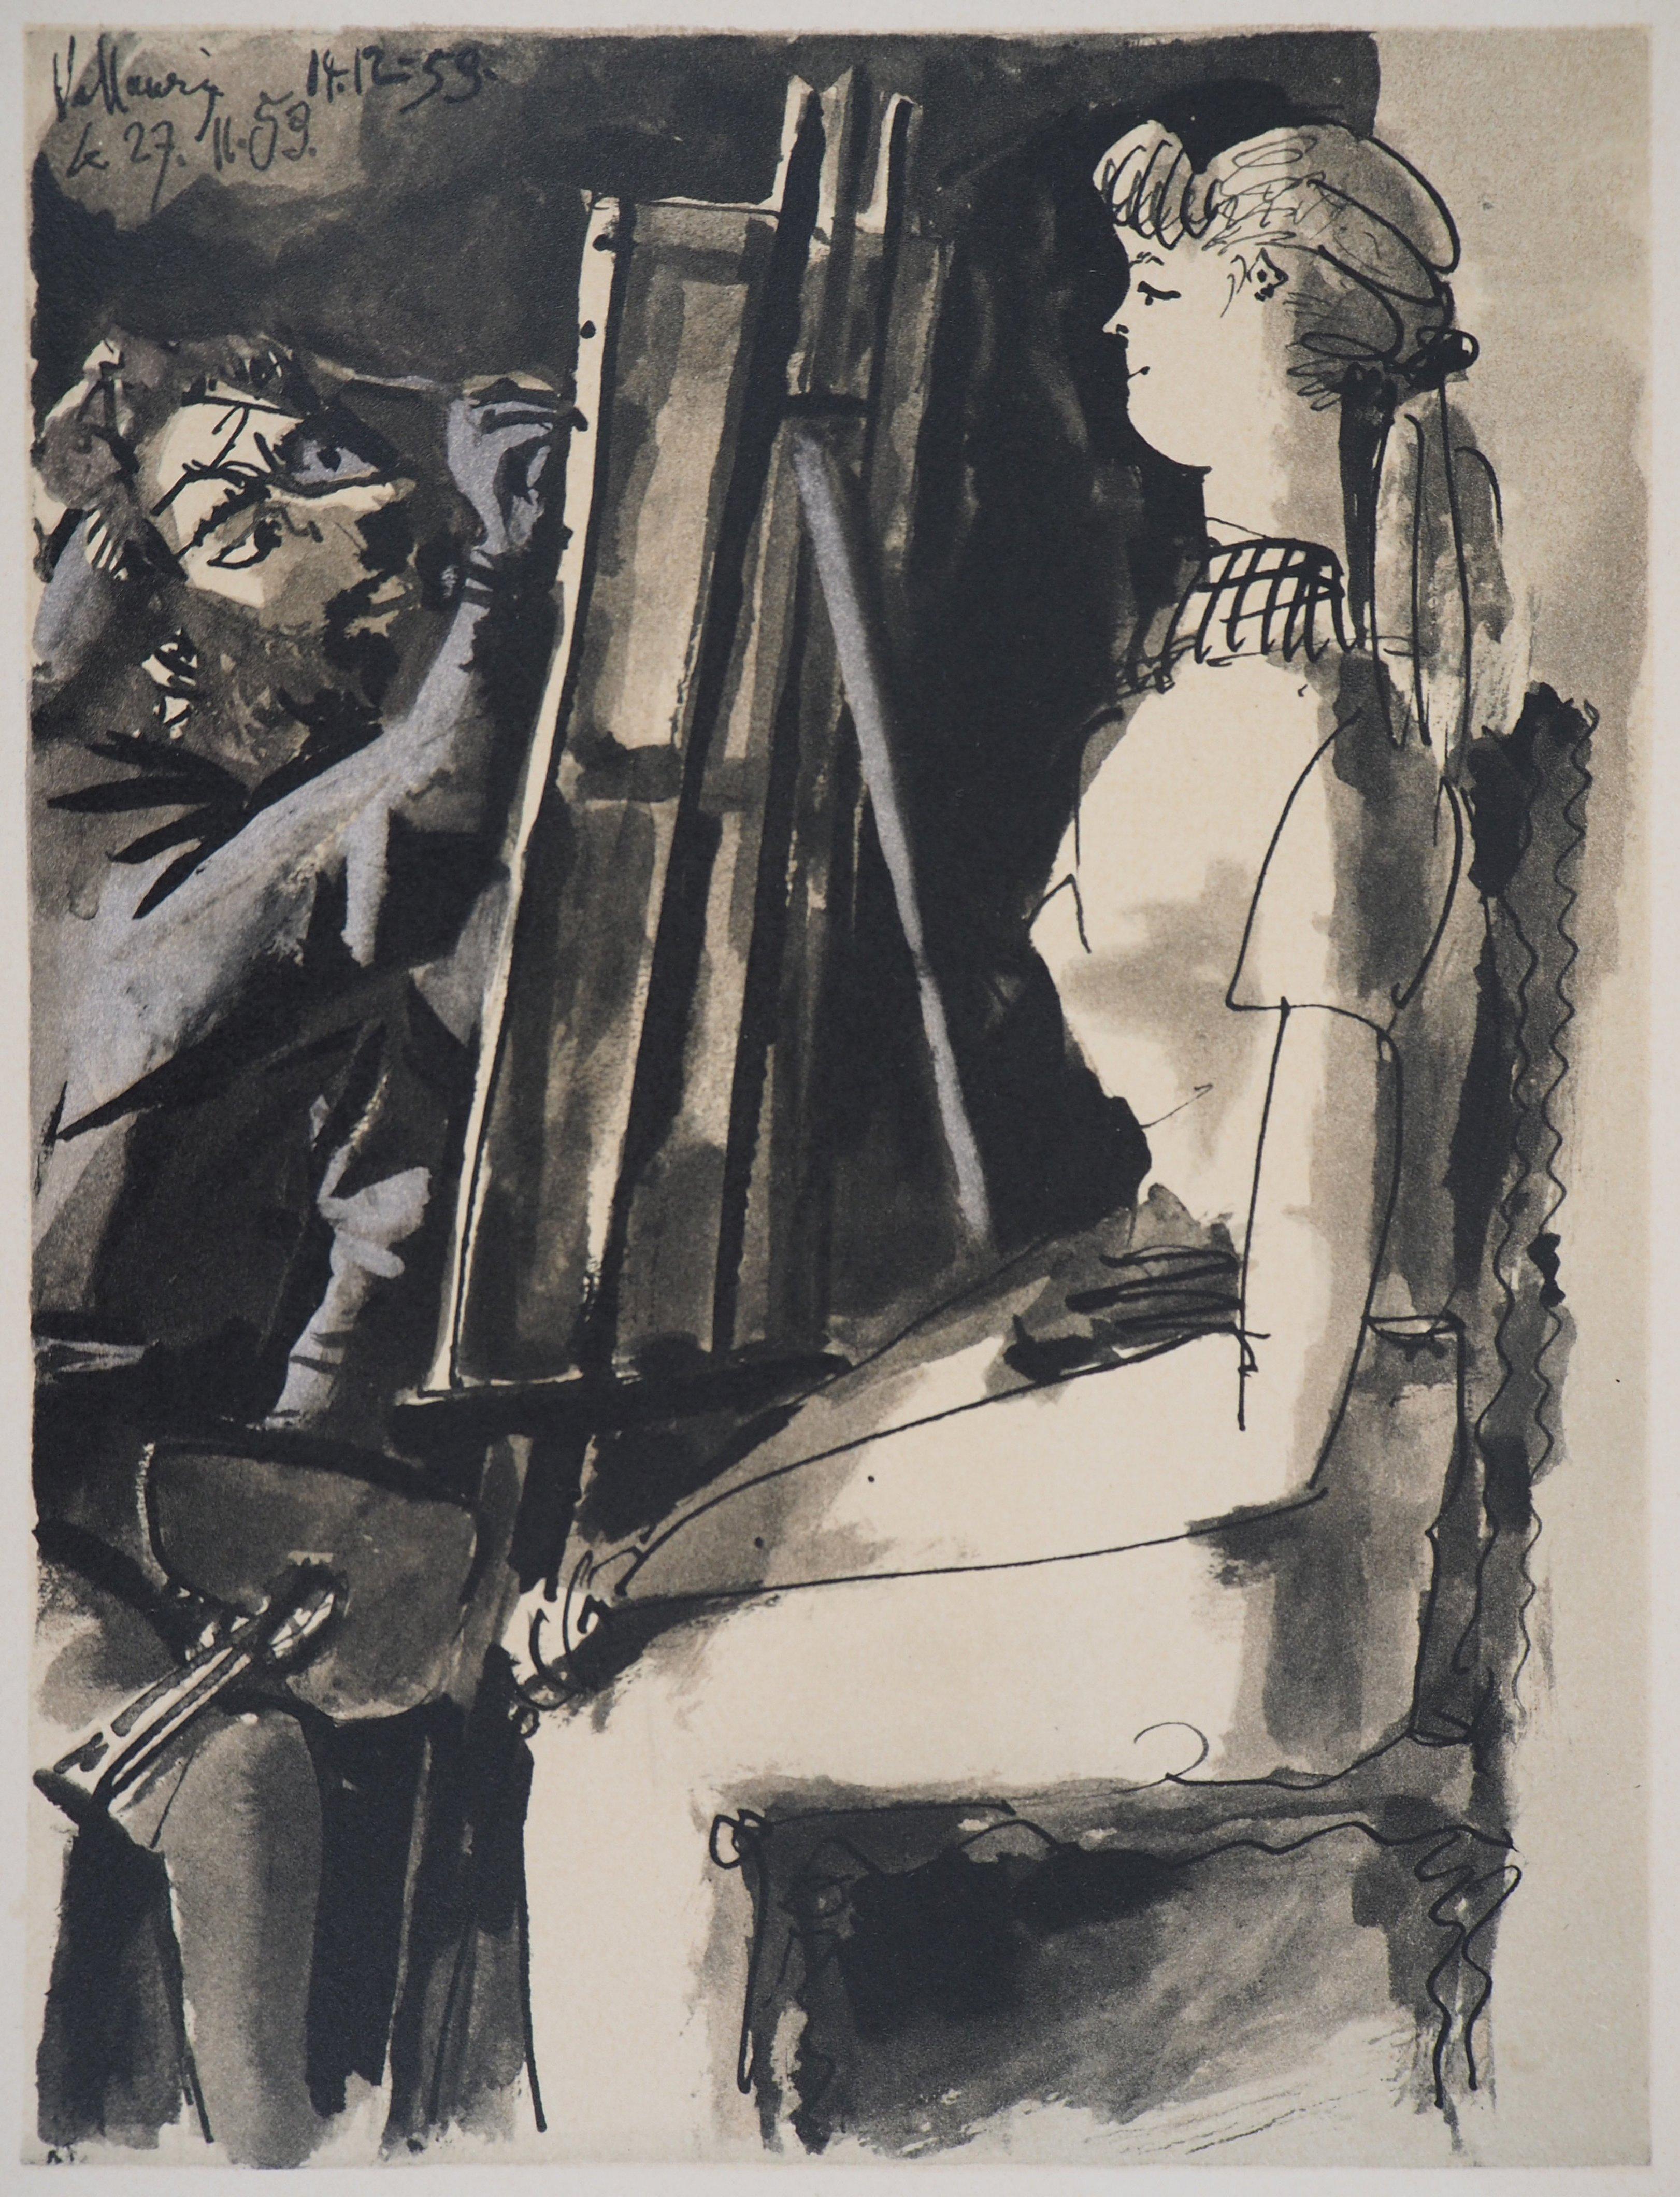 Painter with his Model - Litograph on Arches Vellum - Verve, Mourlot